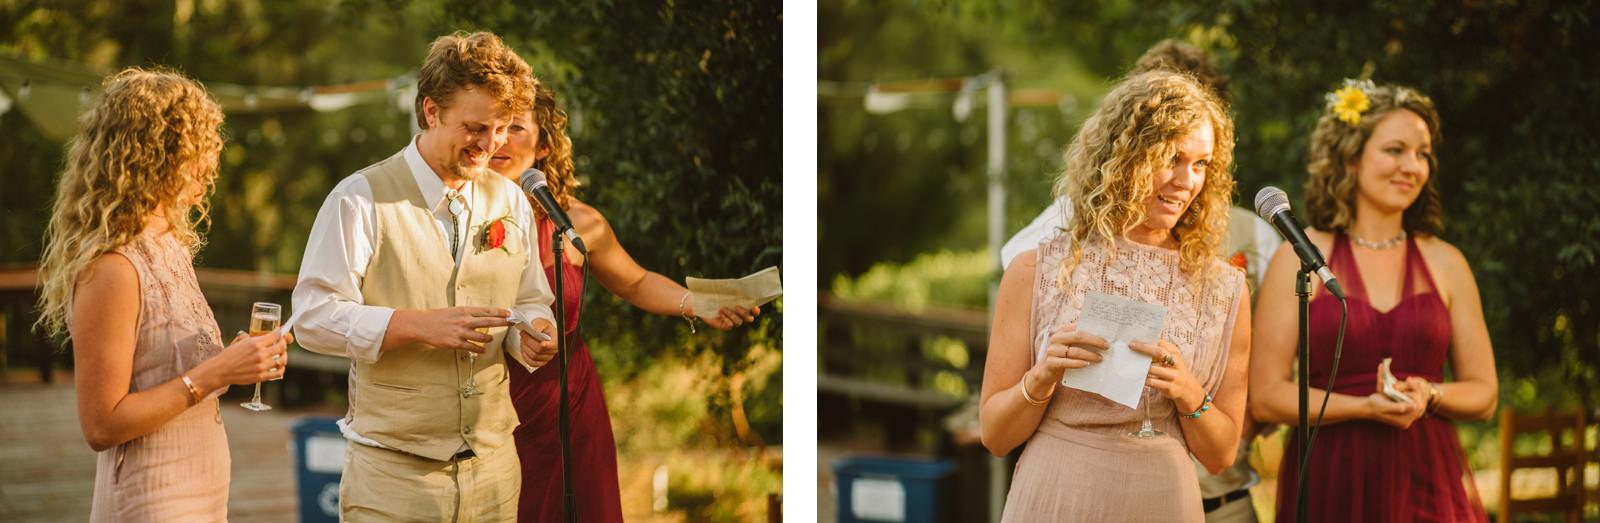 rivers-bend-retreat-wedding-082 RIVER'S BEND RETREAT WEDDING